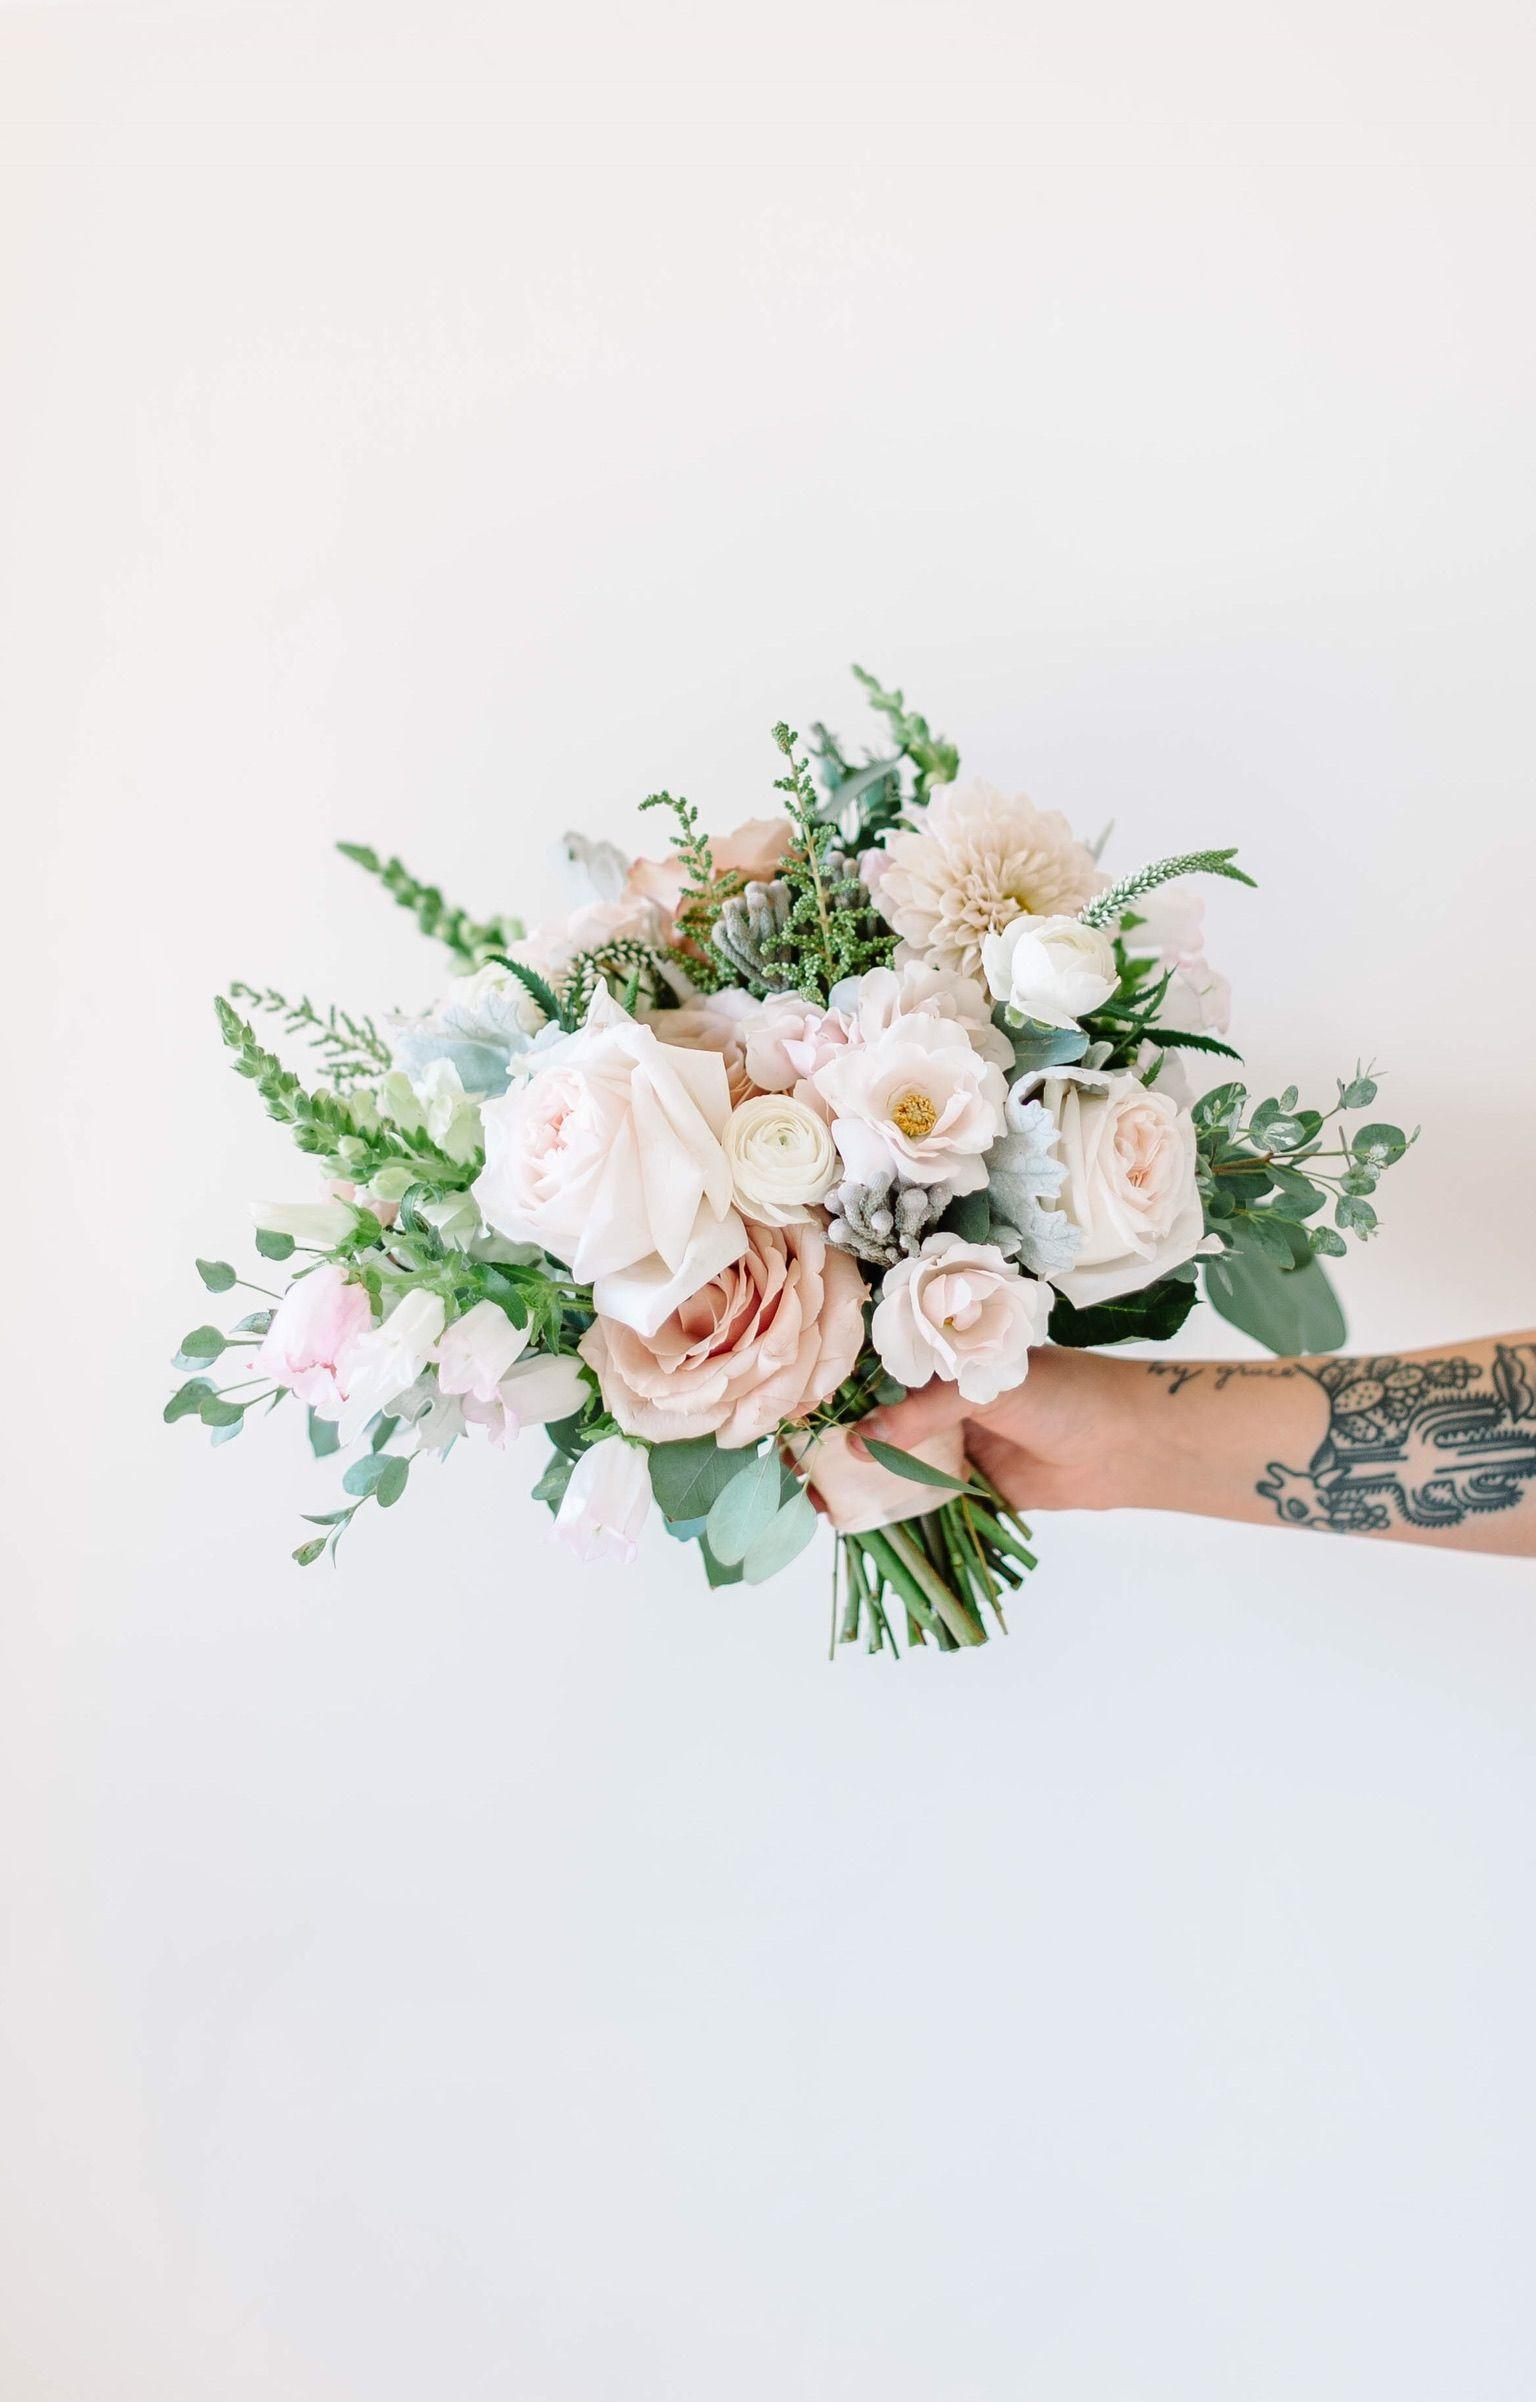 Buy Wedding Flowers Online Buying Wedding Flowers Online Wedding Flowers Wedding Flowers